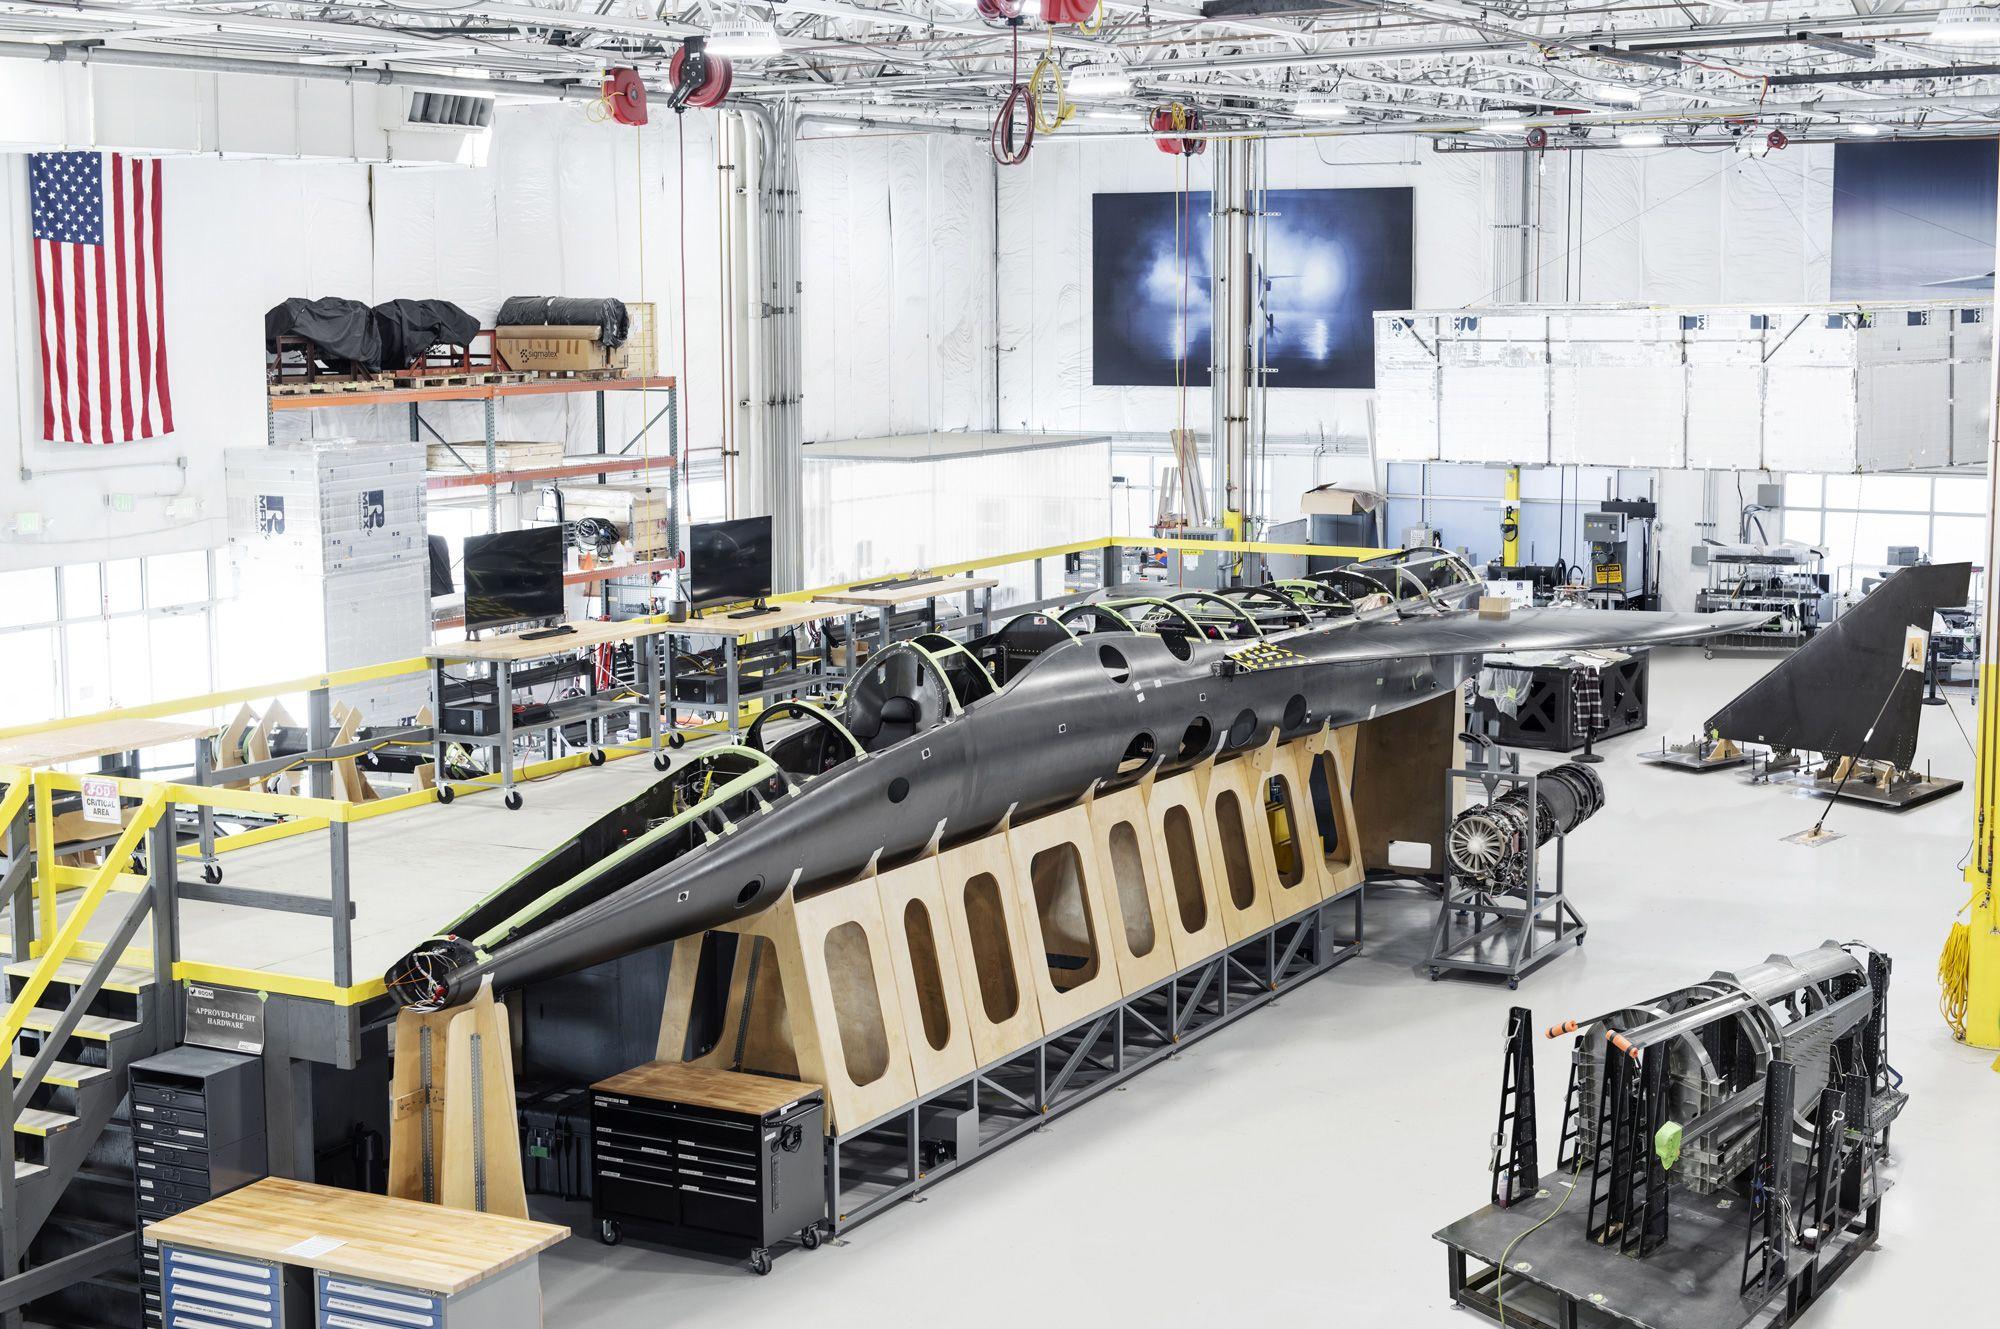 hangar-june-small